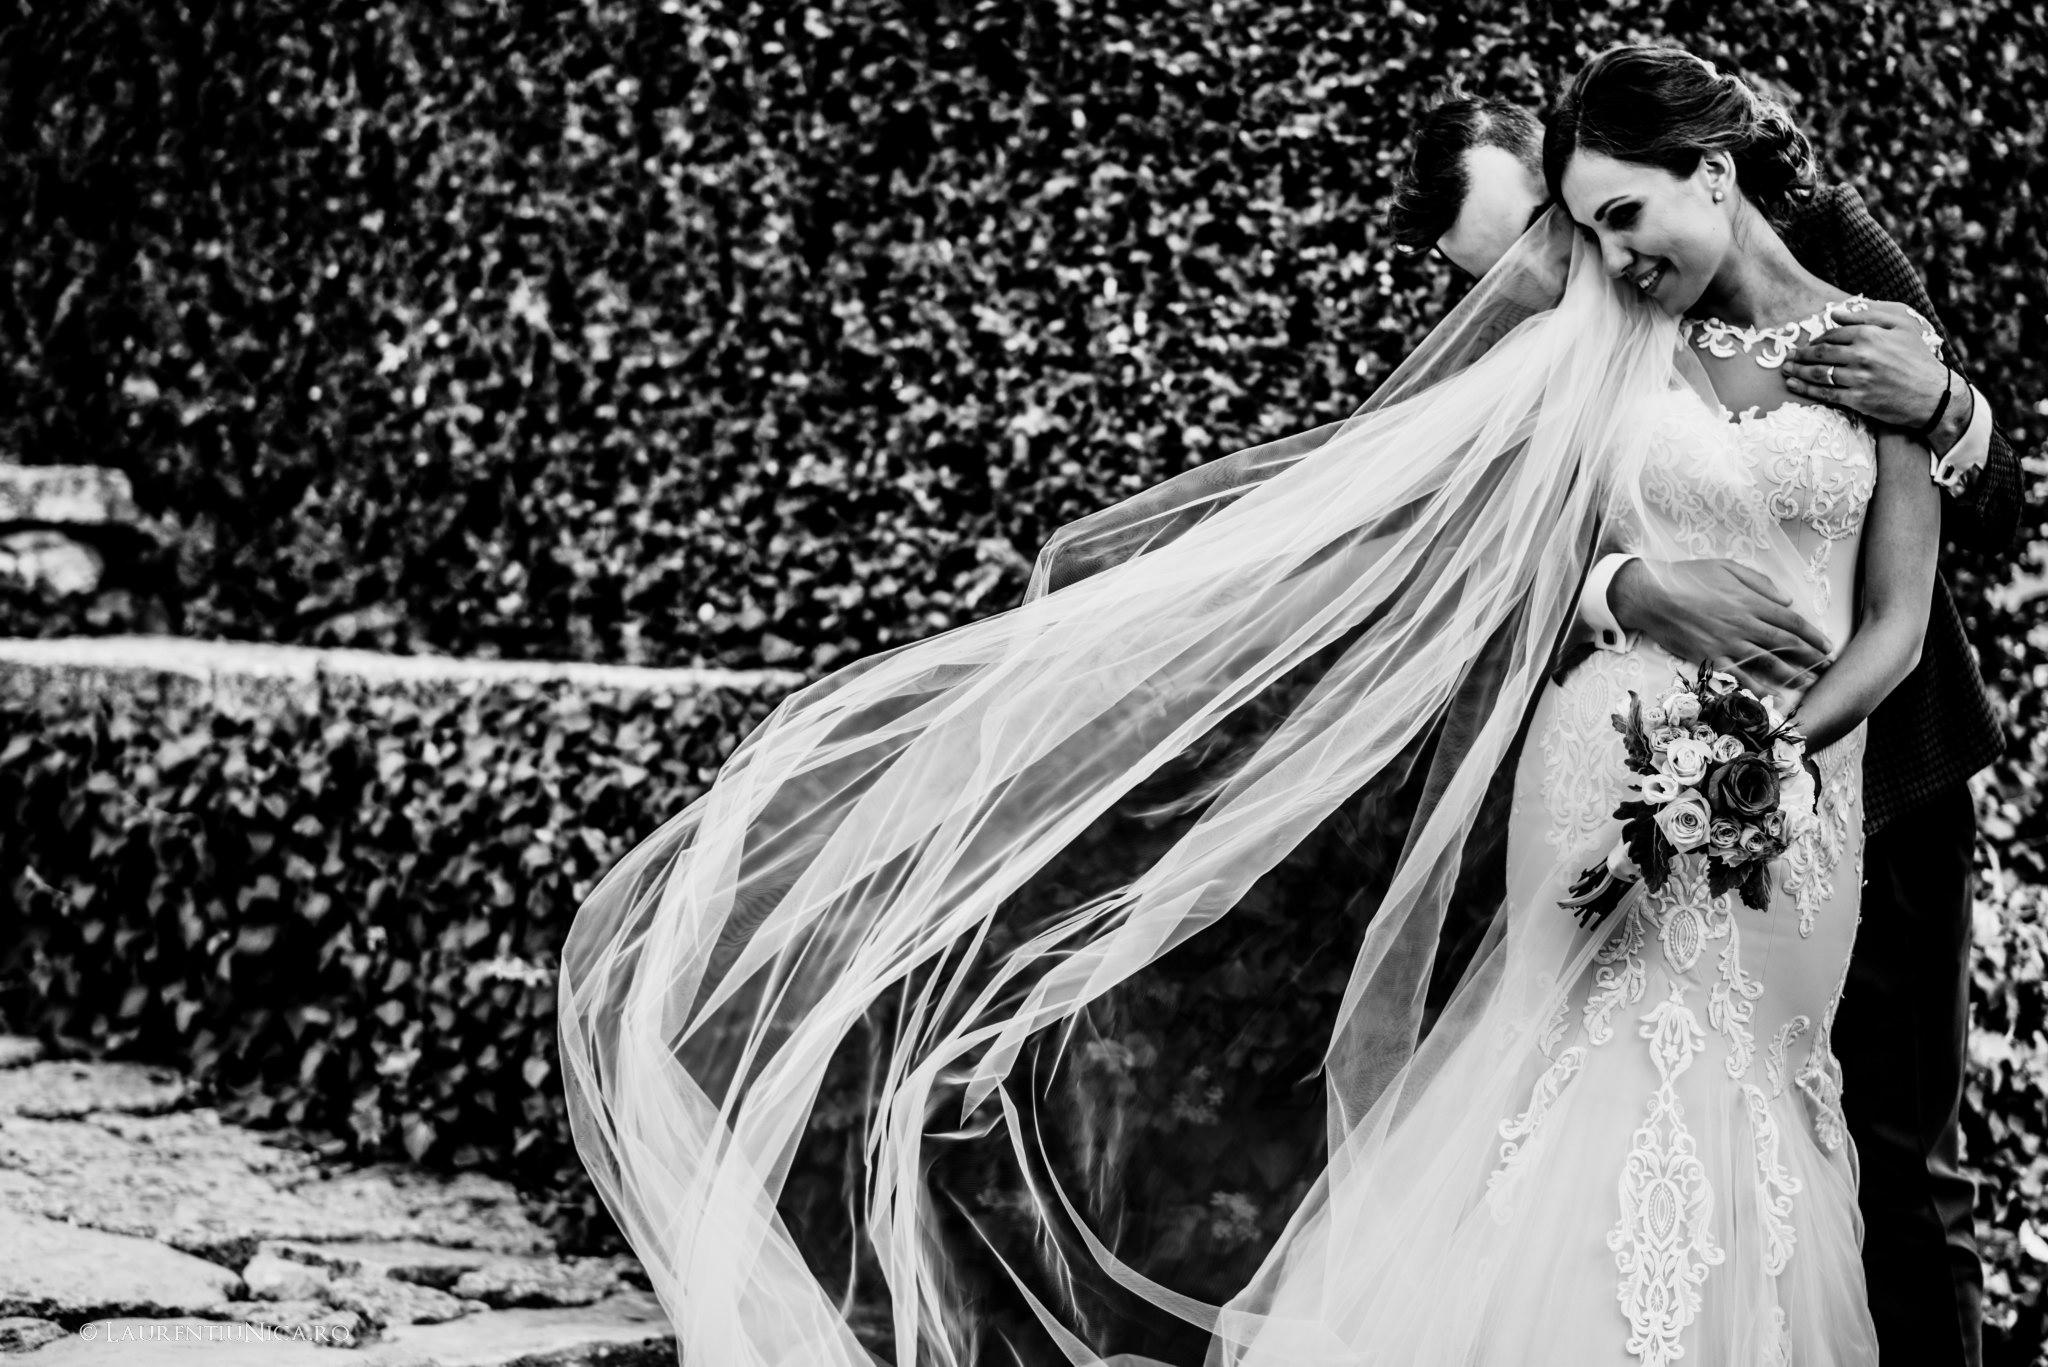 andreea si alin fotografii after wedding balchik bulgaria15 - Andreea & Alin | Fotografii After Wedding | Balchik Bulgaria